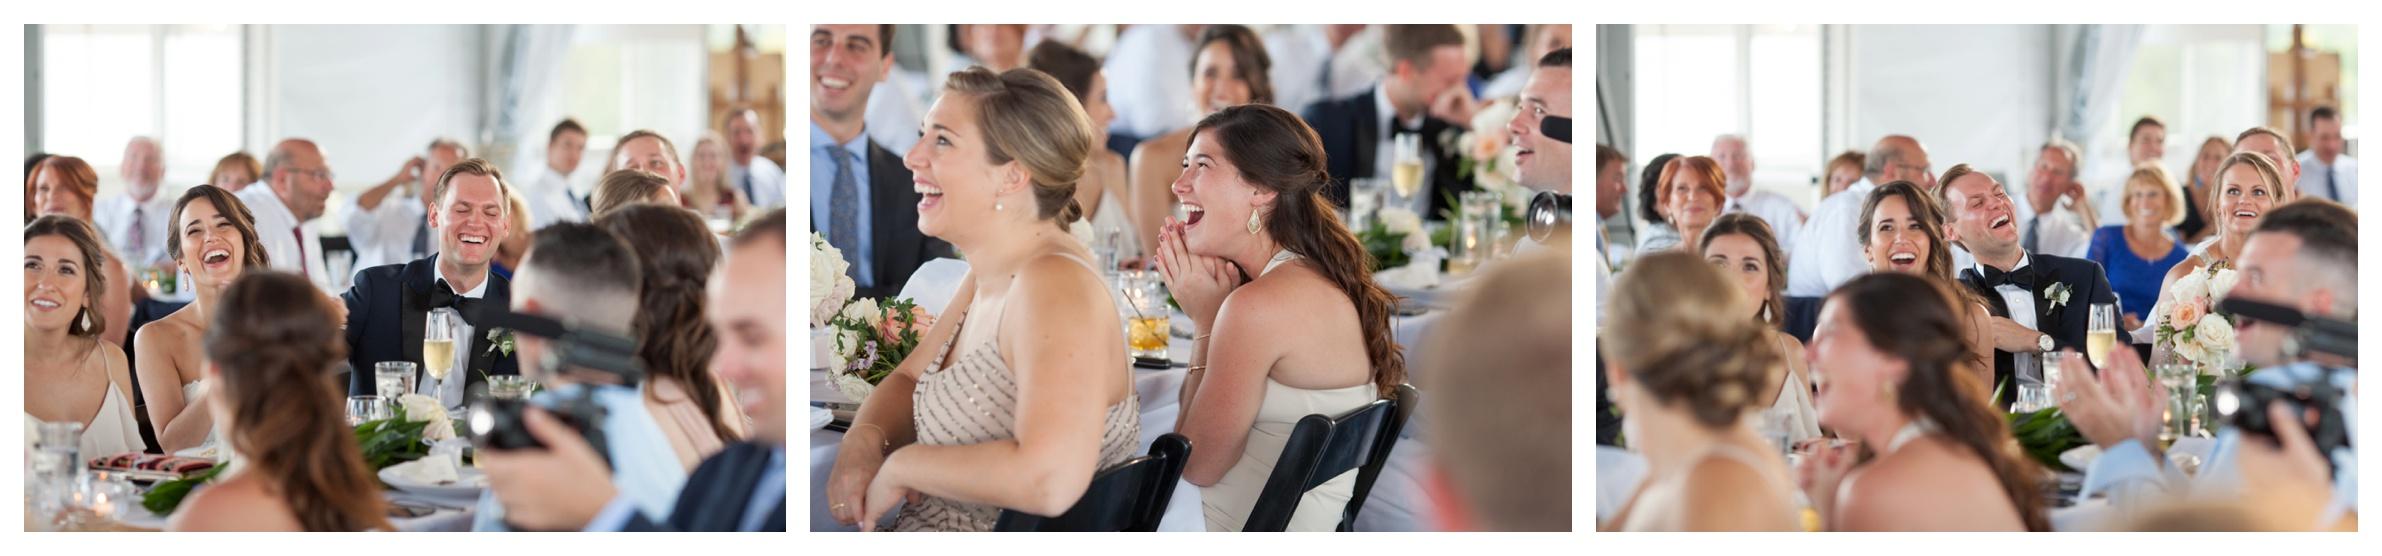 columbia-yacht-club-chicago-wedding_0045.jpg